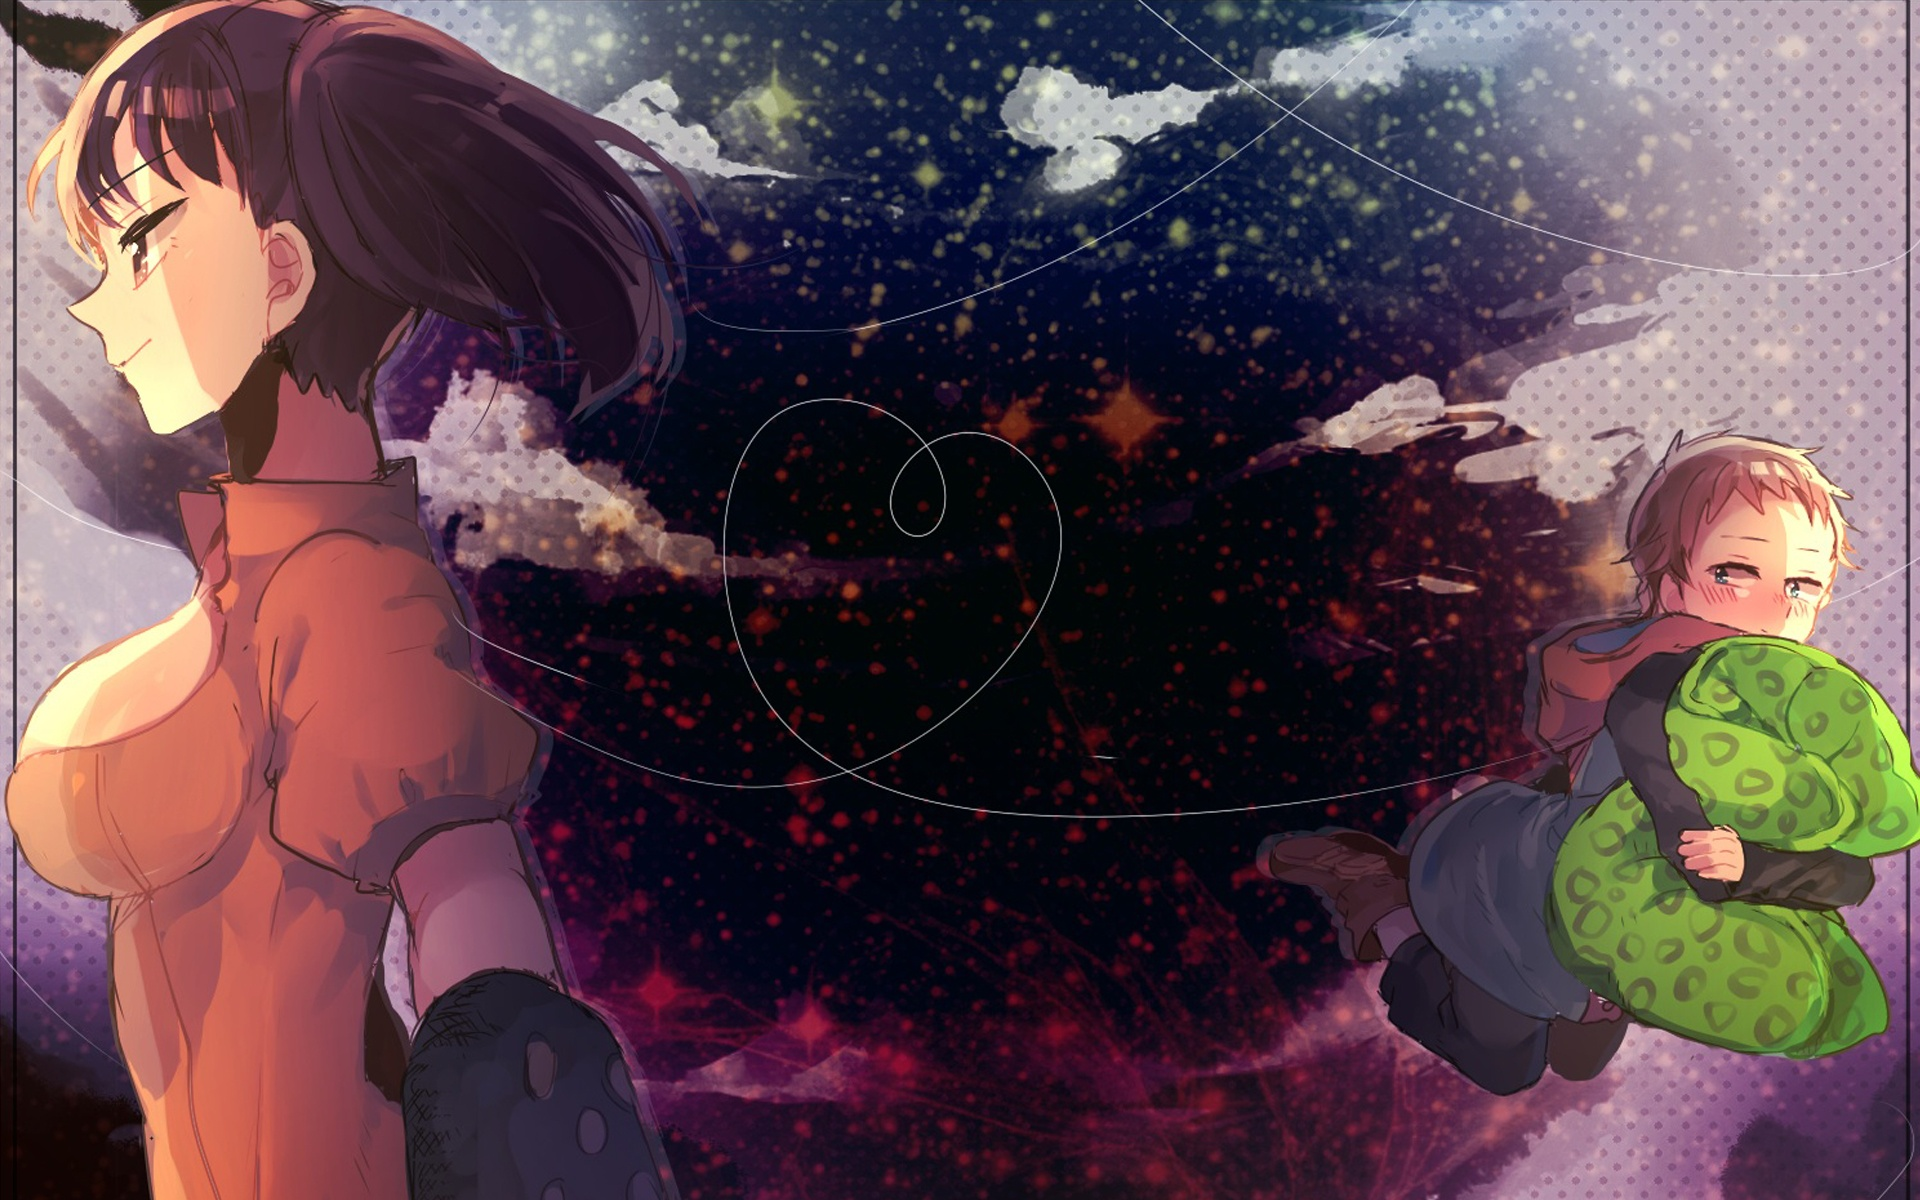 Nanatsu No Taizai Images Seven Deadly Kings Diane King Nanatsu No Taizai Anime X Hd